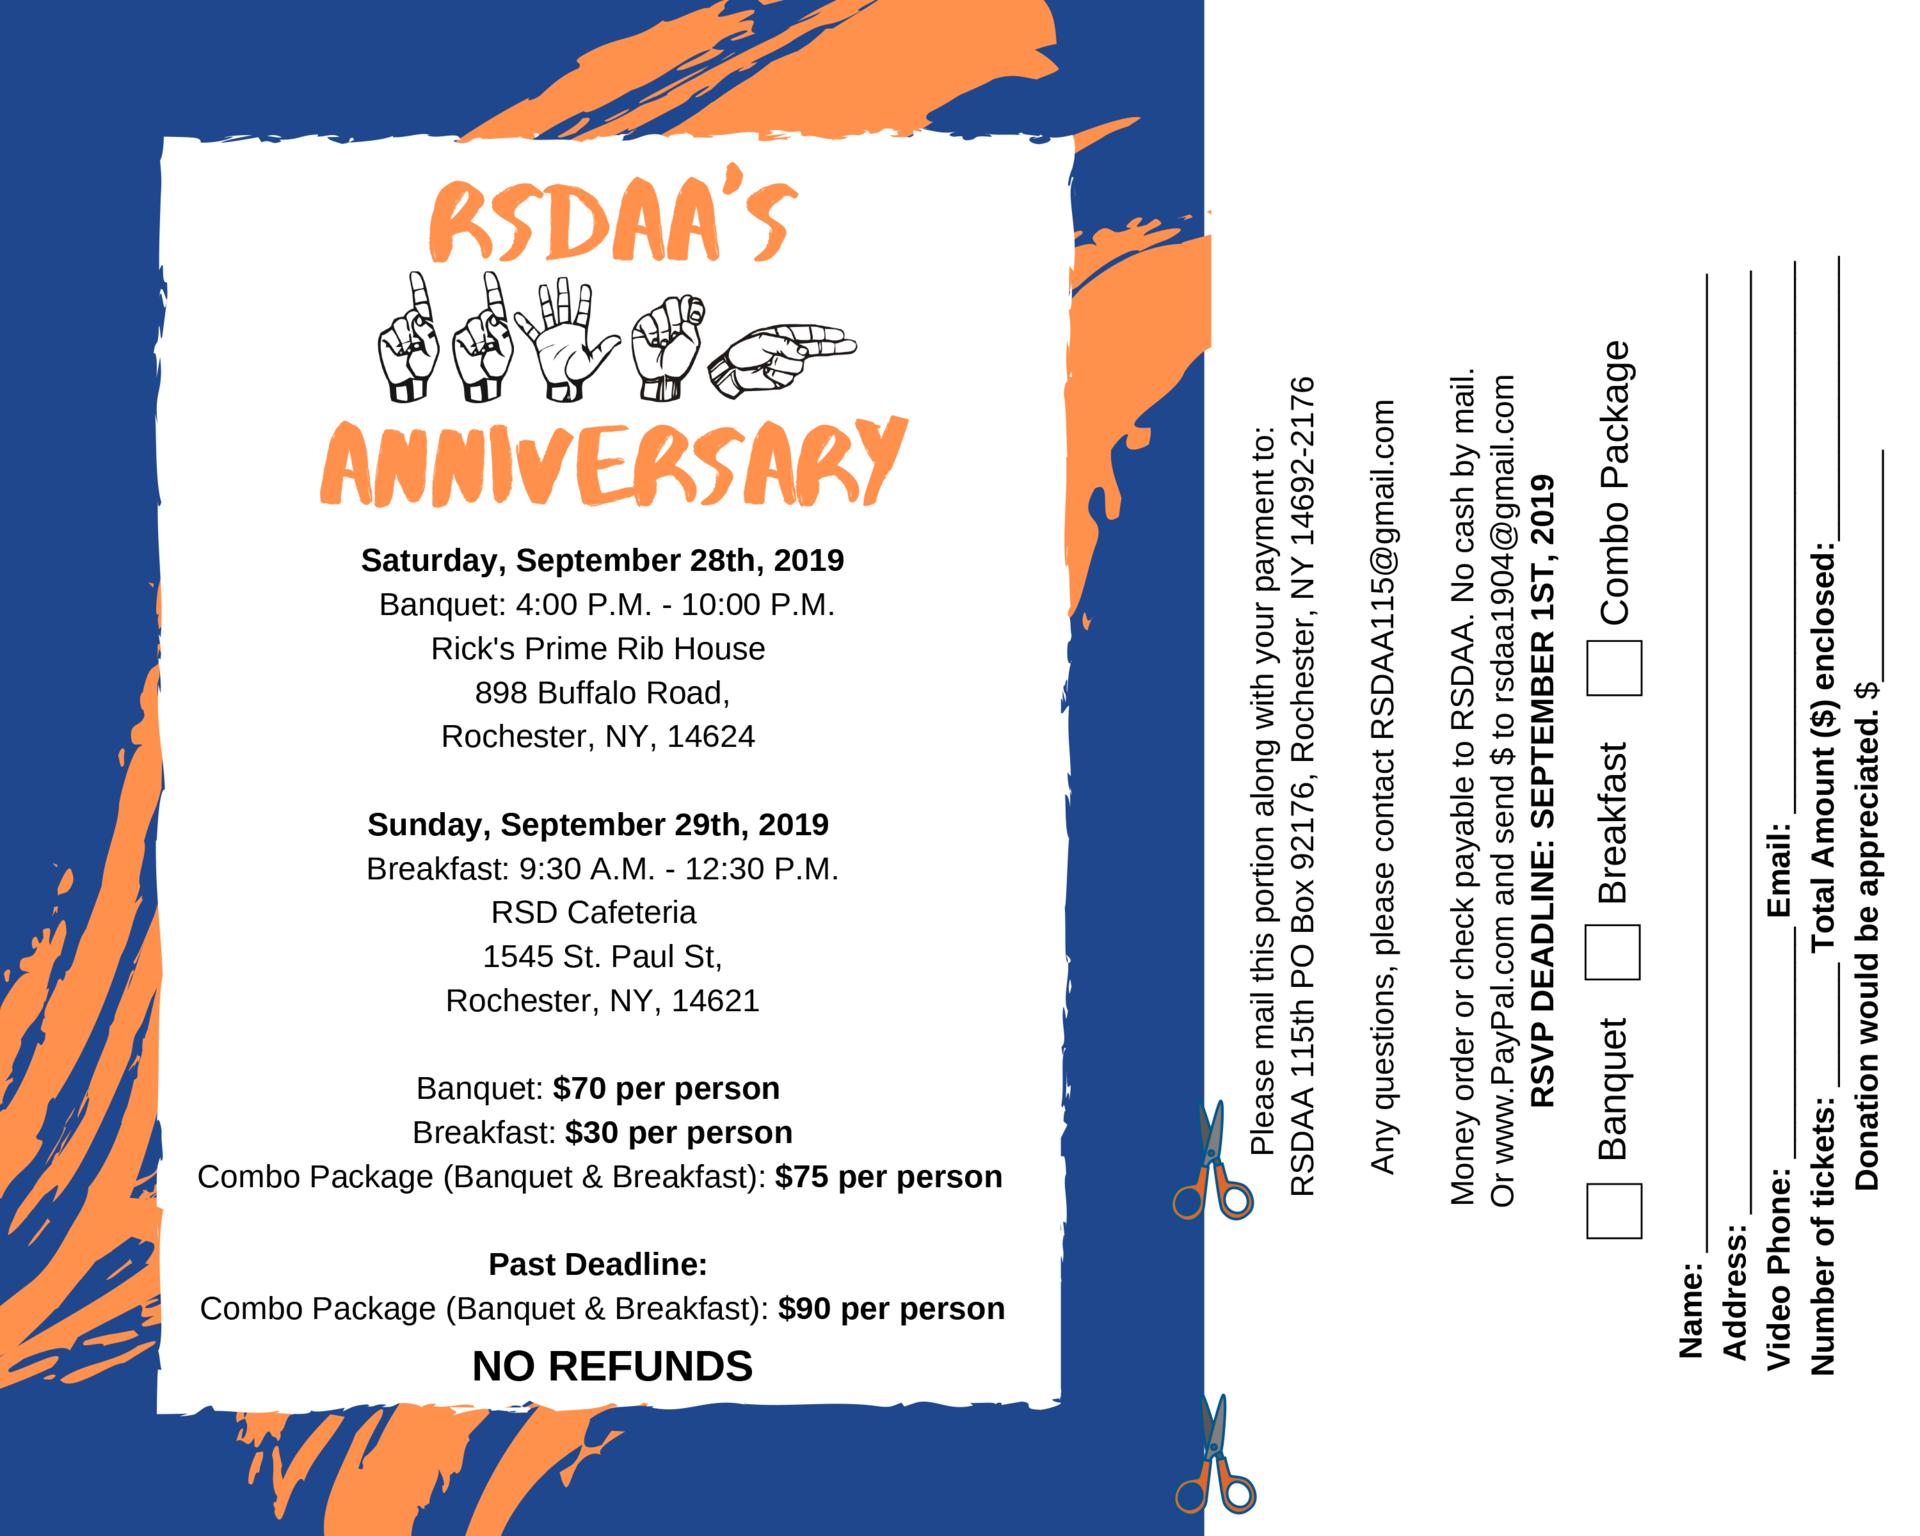 RSDAA 115th Anniversary Invitation page 1